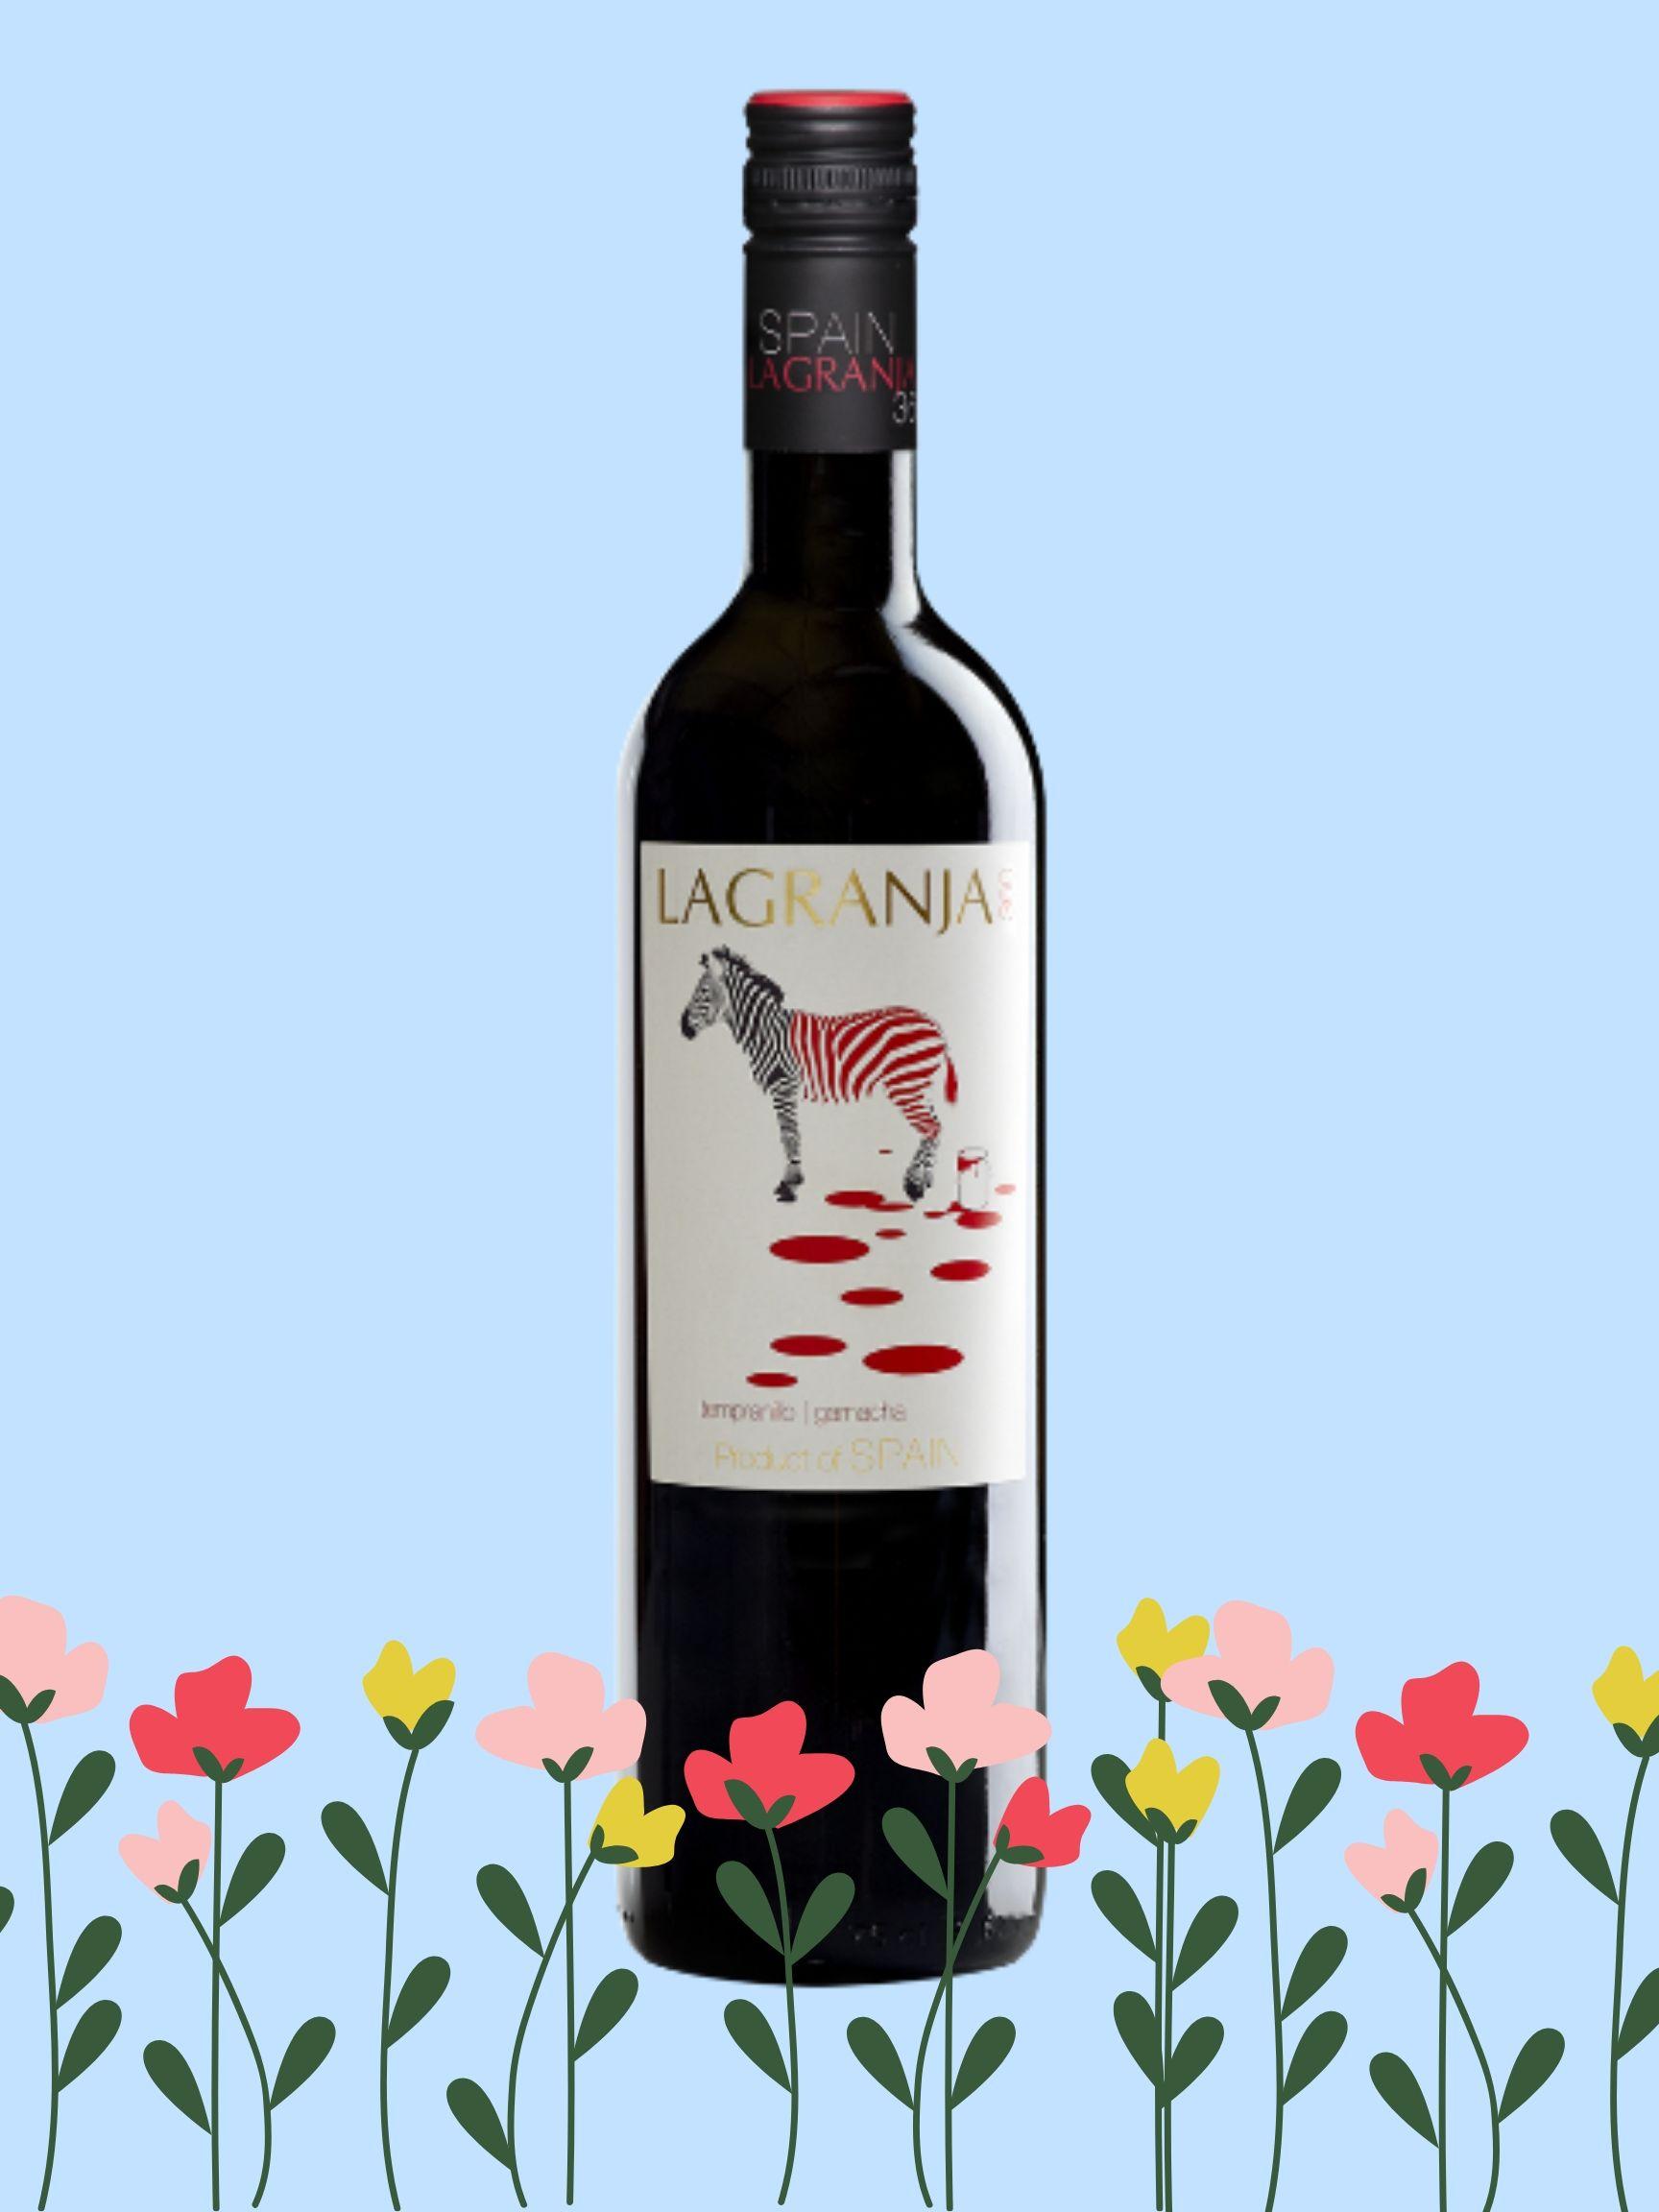 vegan wine, vegan wine from trader joes, vegan grocery , vegan alcohol